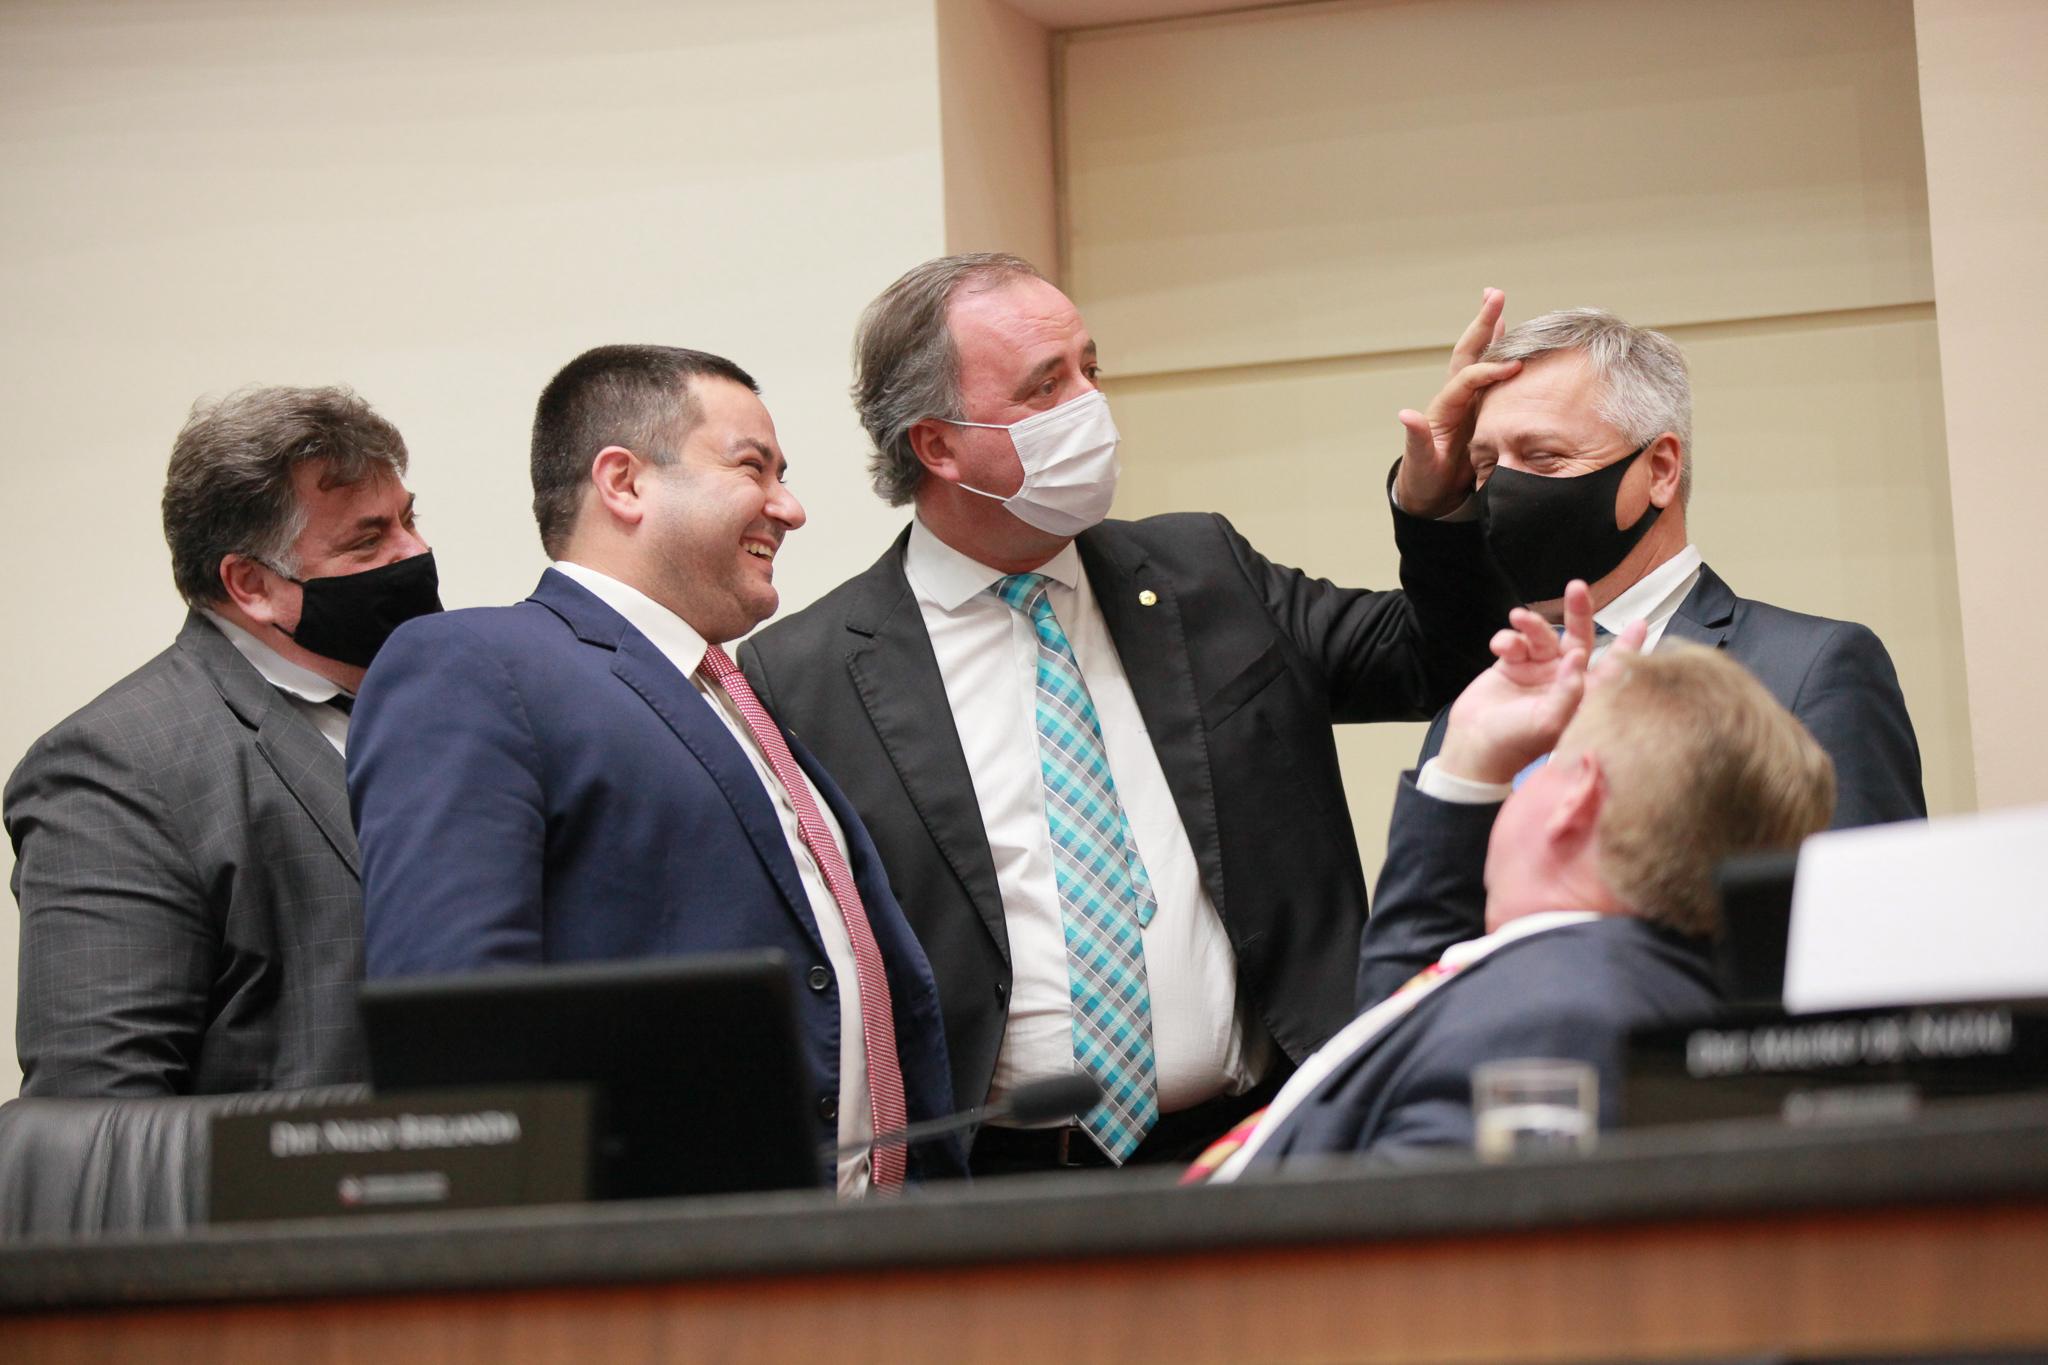 IMAGEM: Assembleia de Santa Catarina aprova compra de vacina pela iniciativa privada